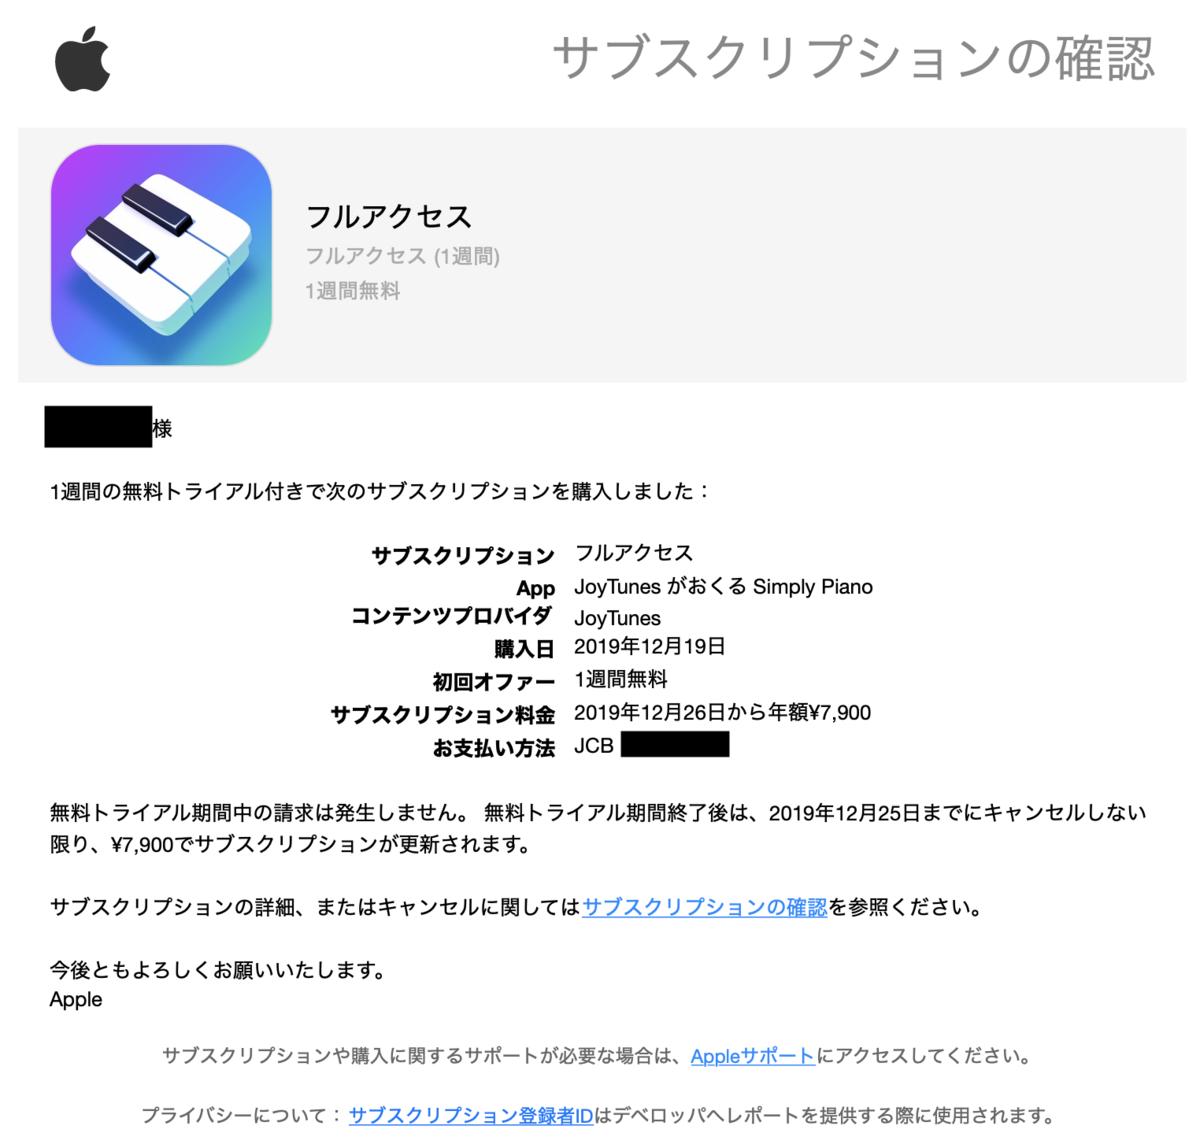 f:id:hardshopper:20191227202048p:plain